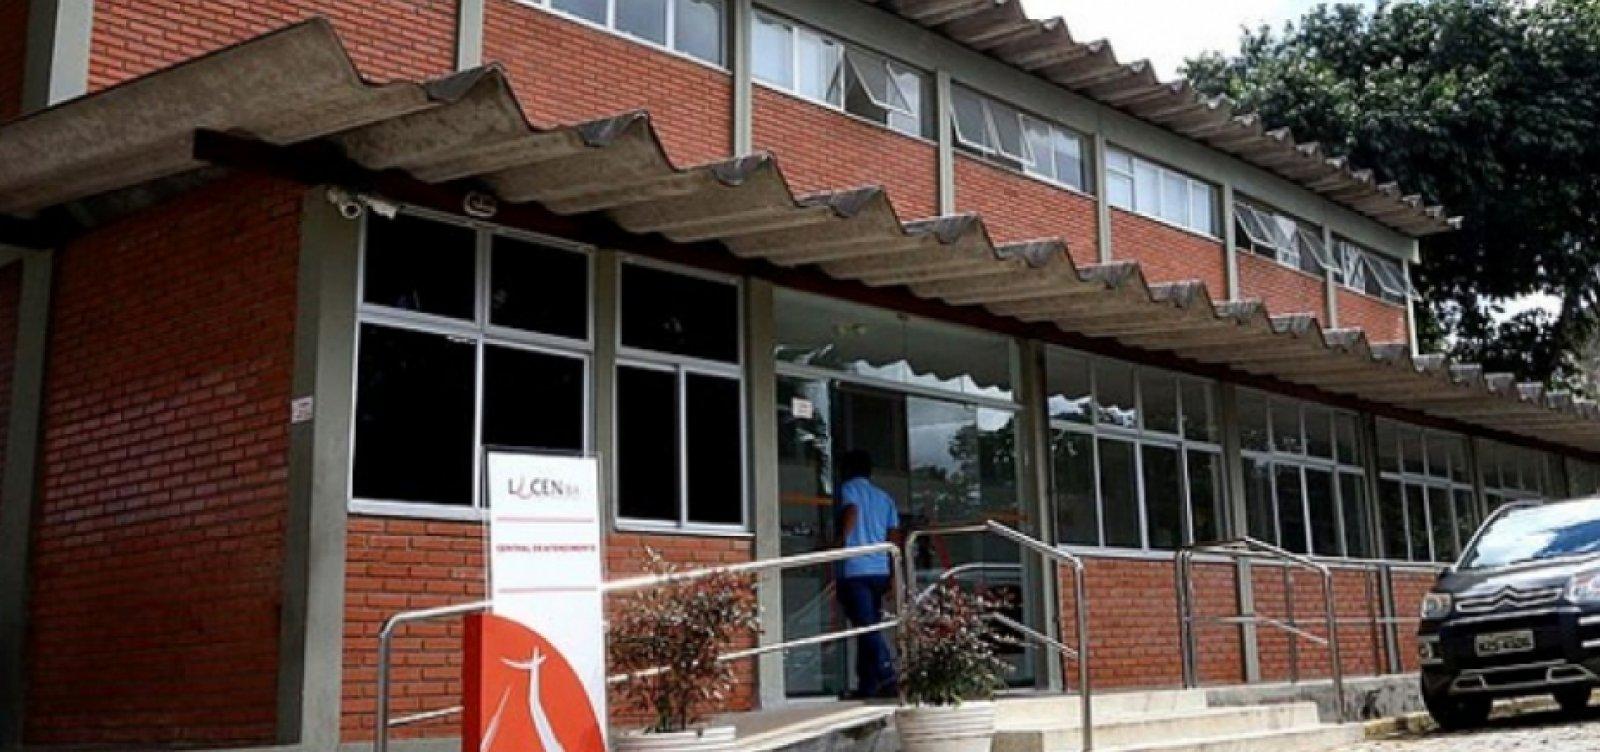 Coronavírus: Bahia teve 17 casos suspeitos; oito seguem sob análise